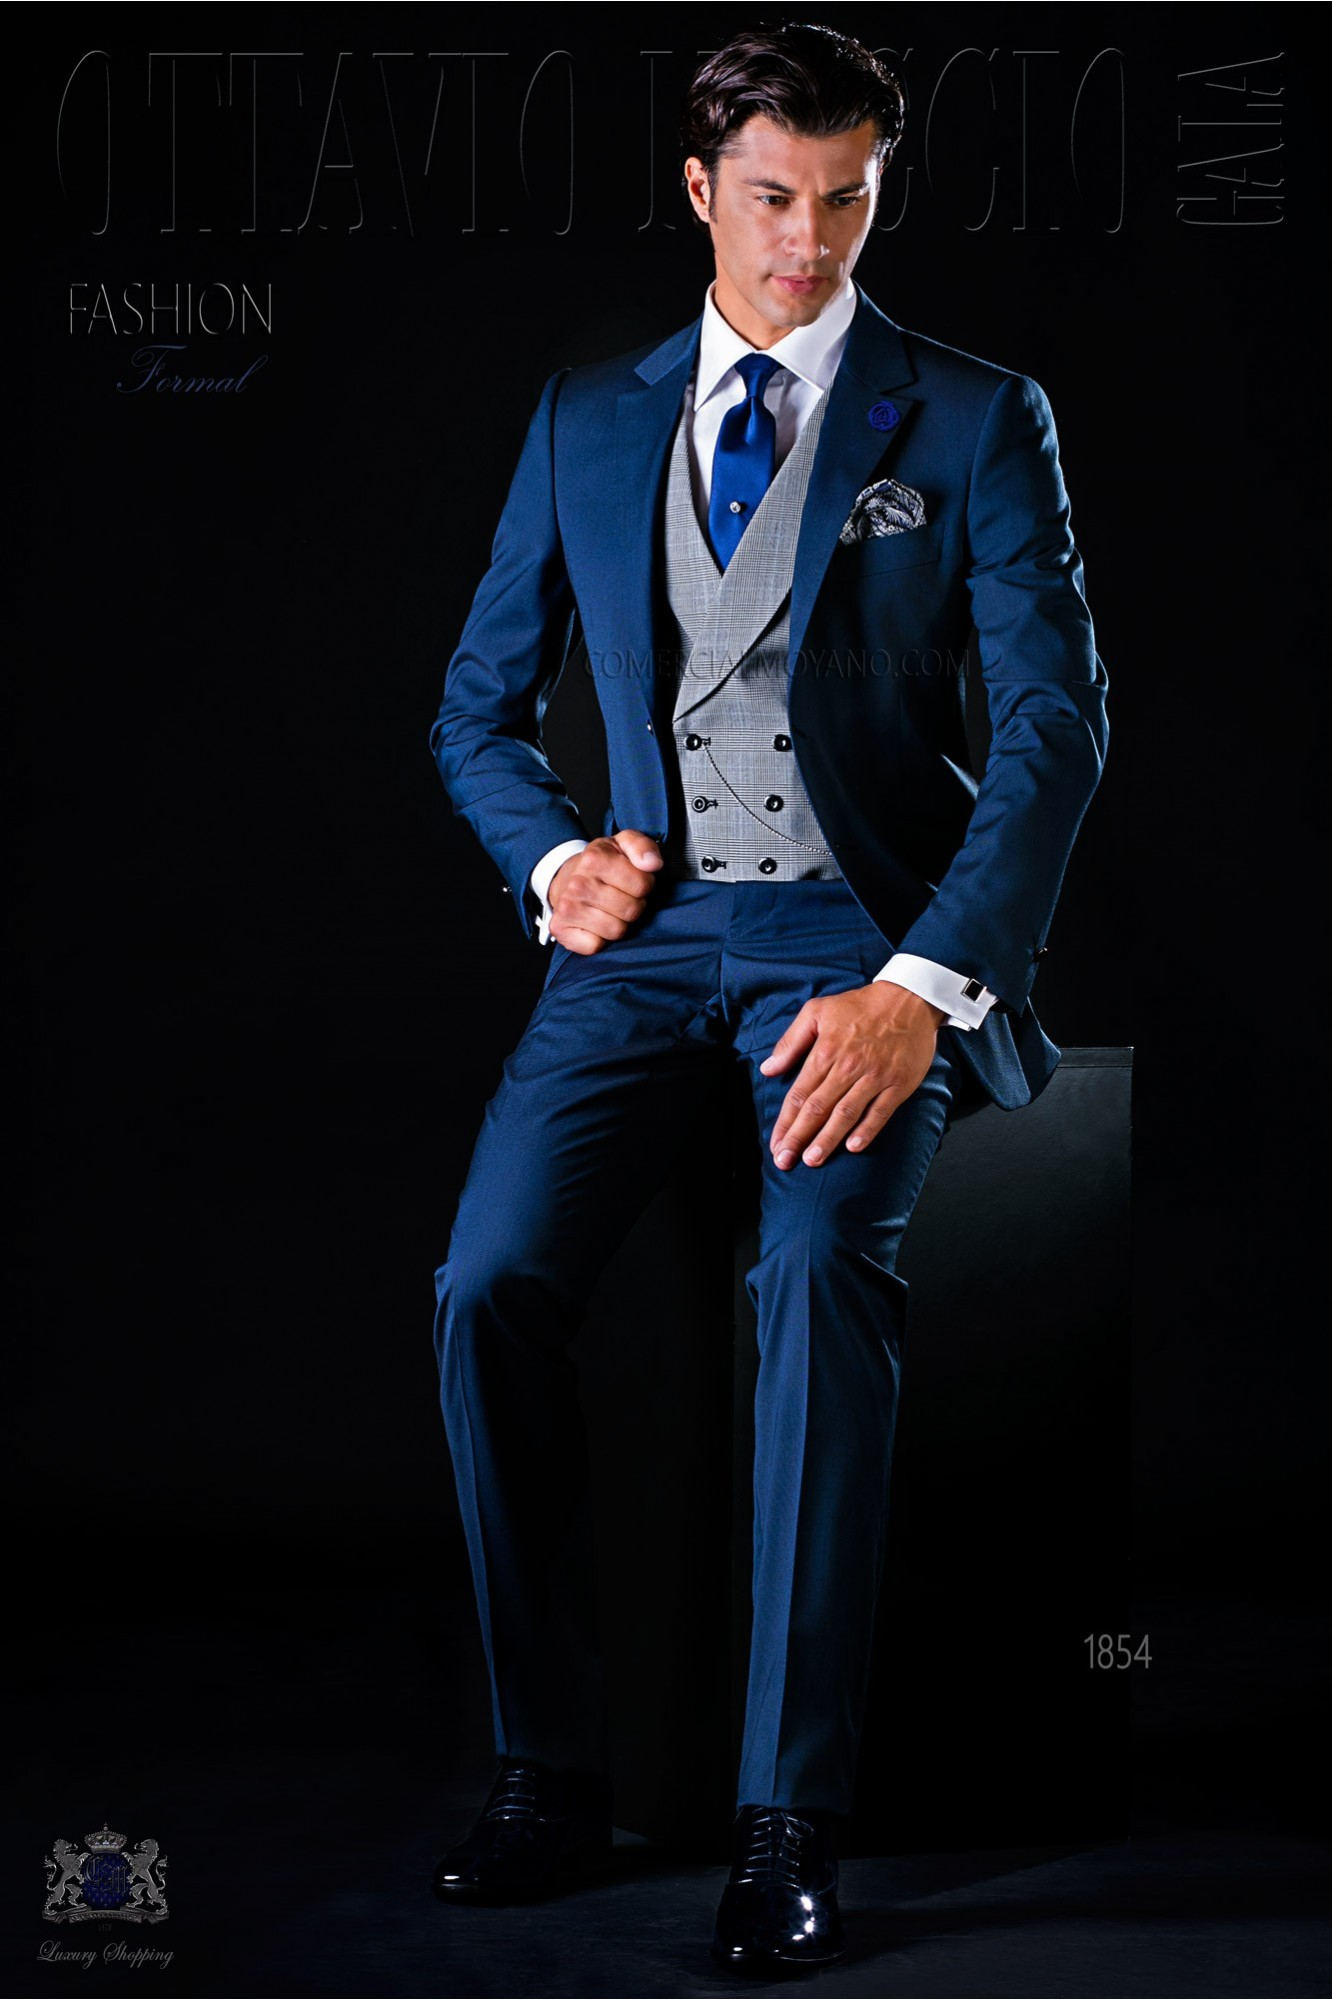 Traje de novio moderno azul con 2 botones modelo: 1854 Ottavio Nuccio Gala colección Fashion